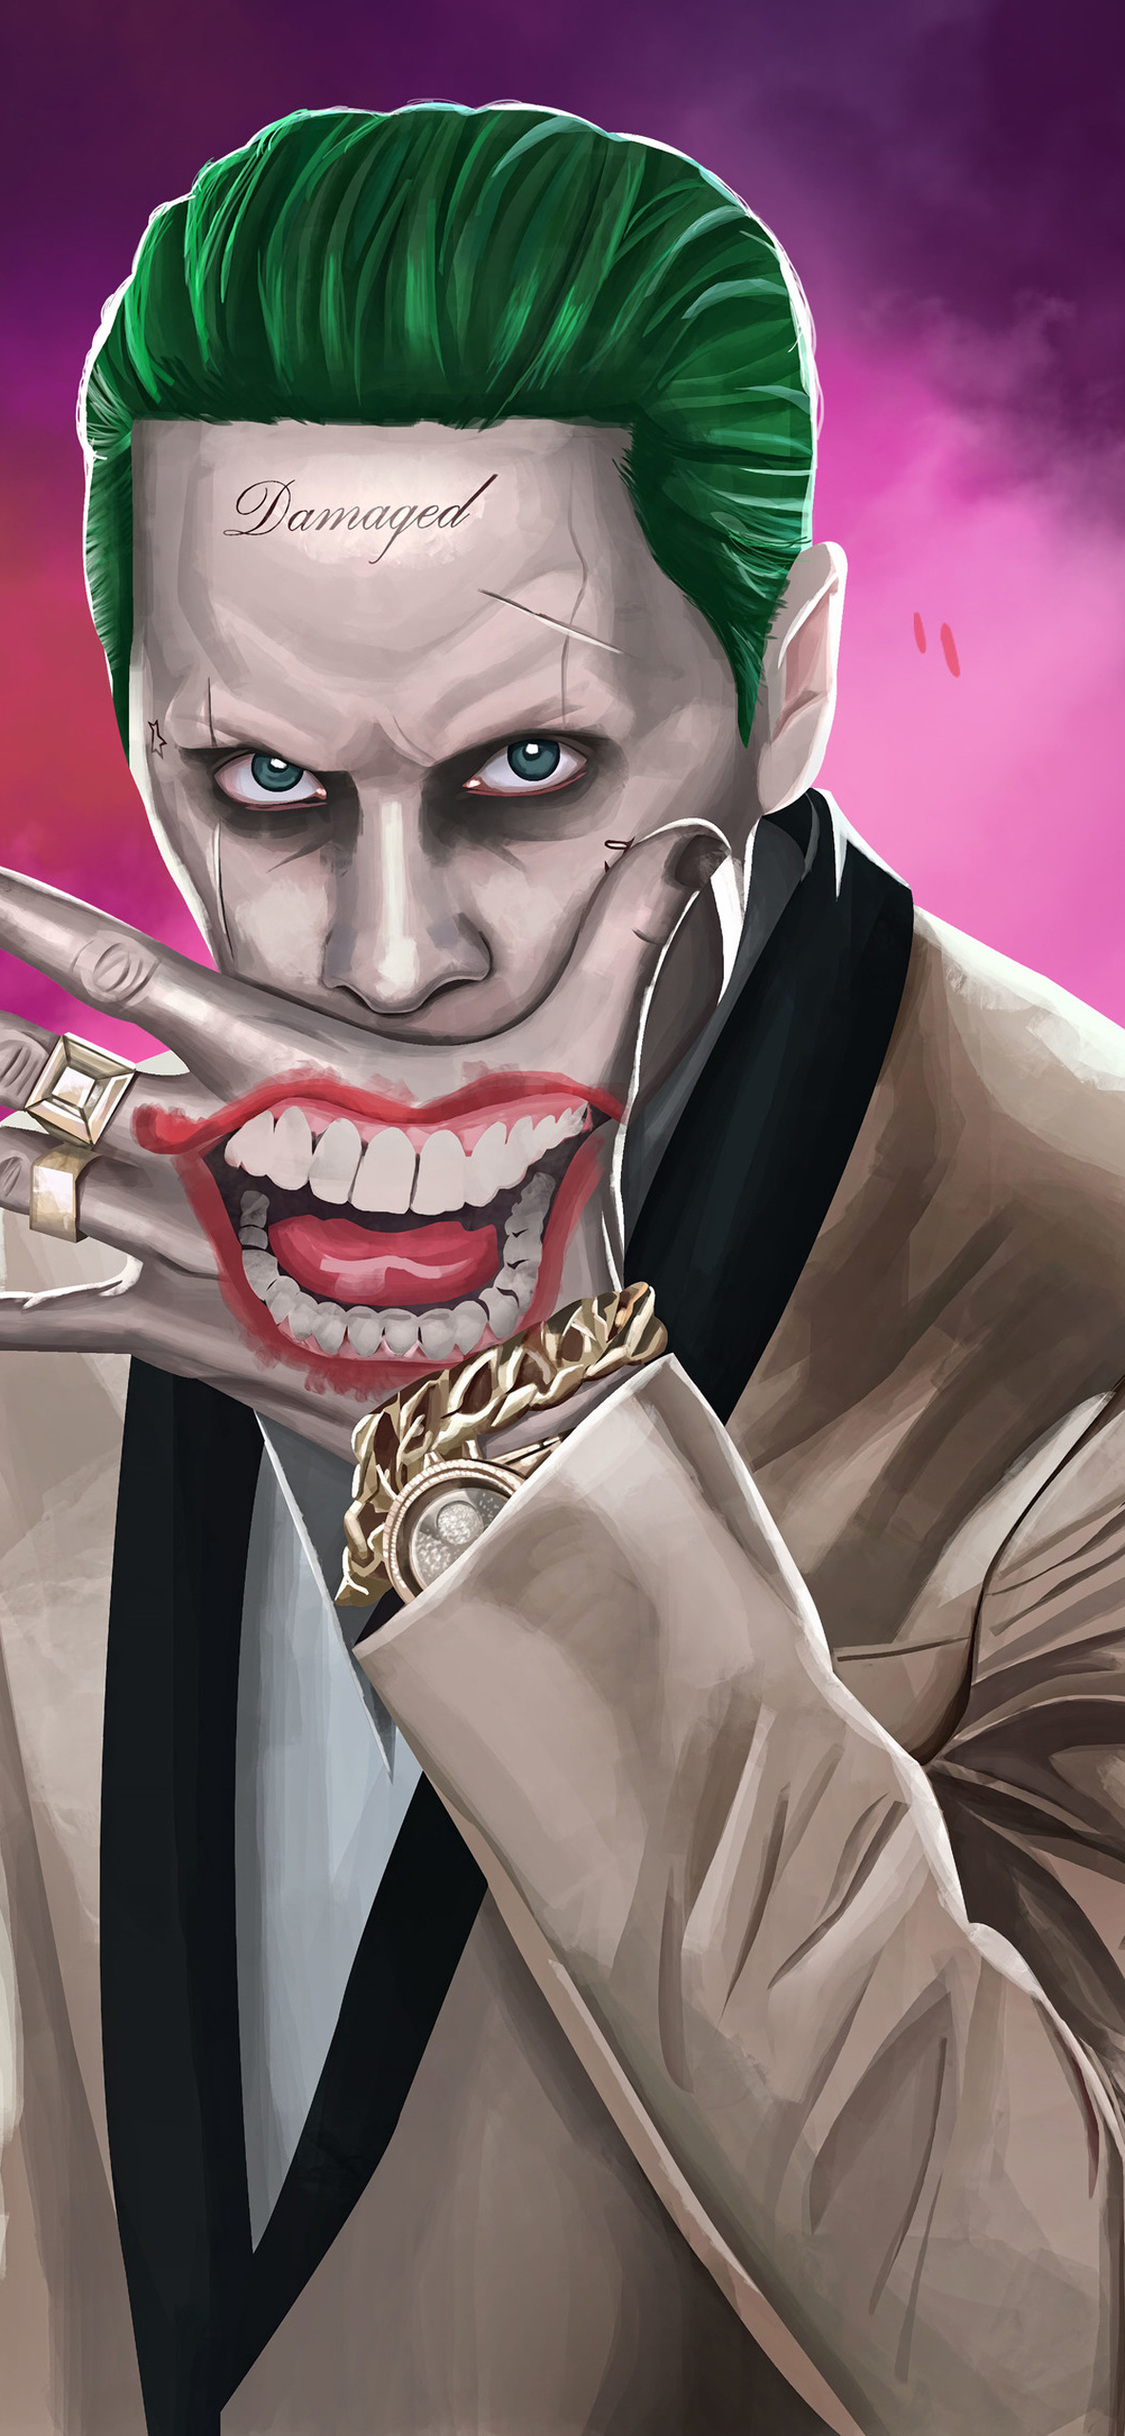 1125x2436 Joker Suicide Squad Artwork Hd Iphone Xs Iphone 10 Iphone